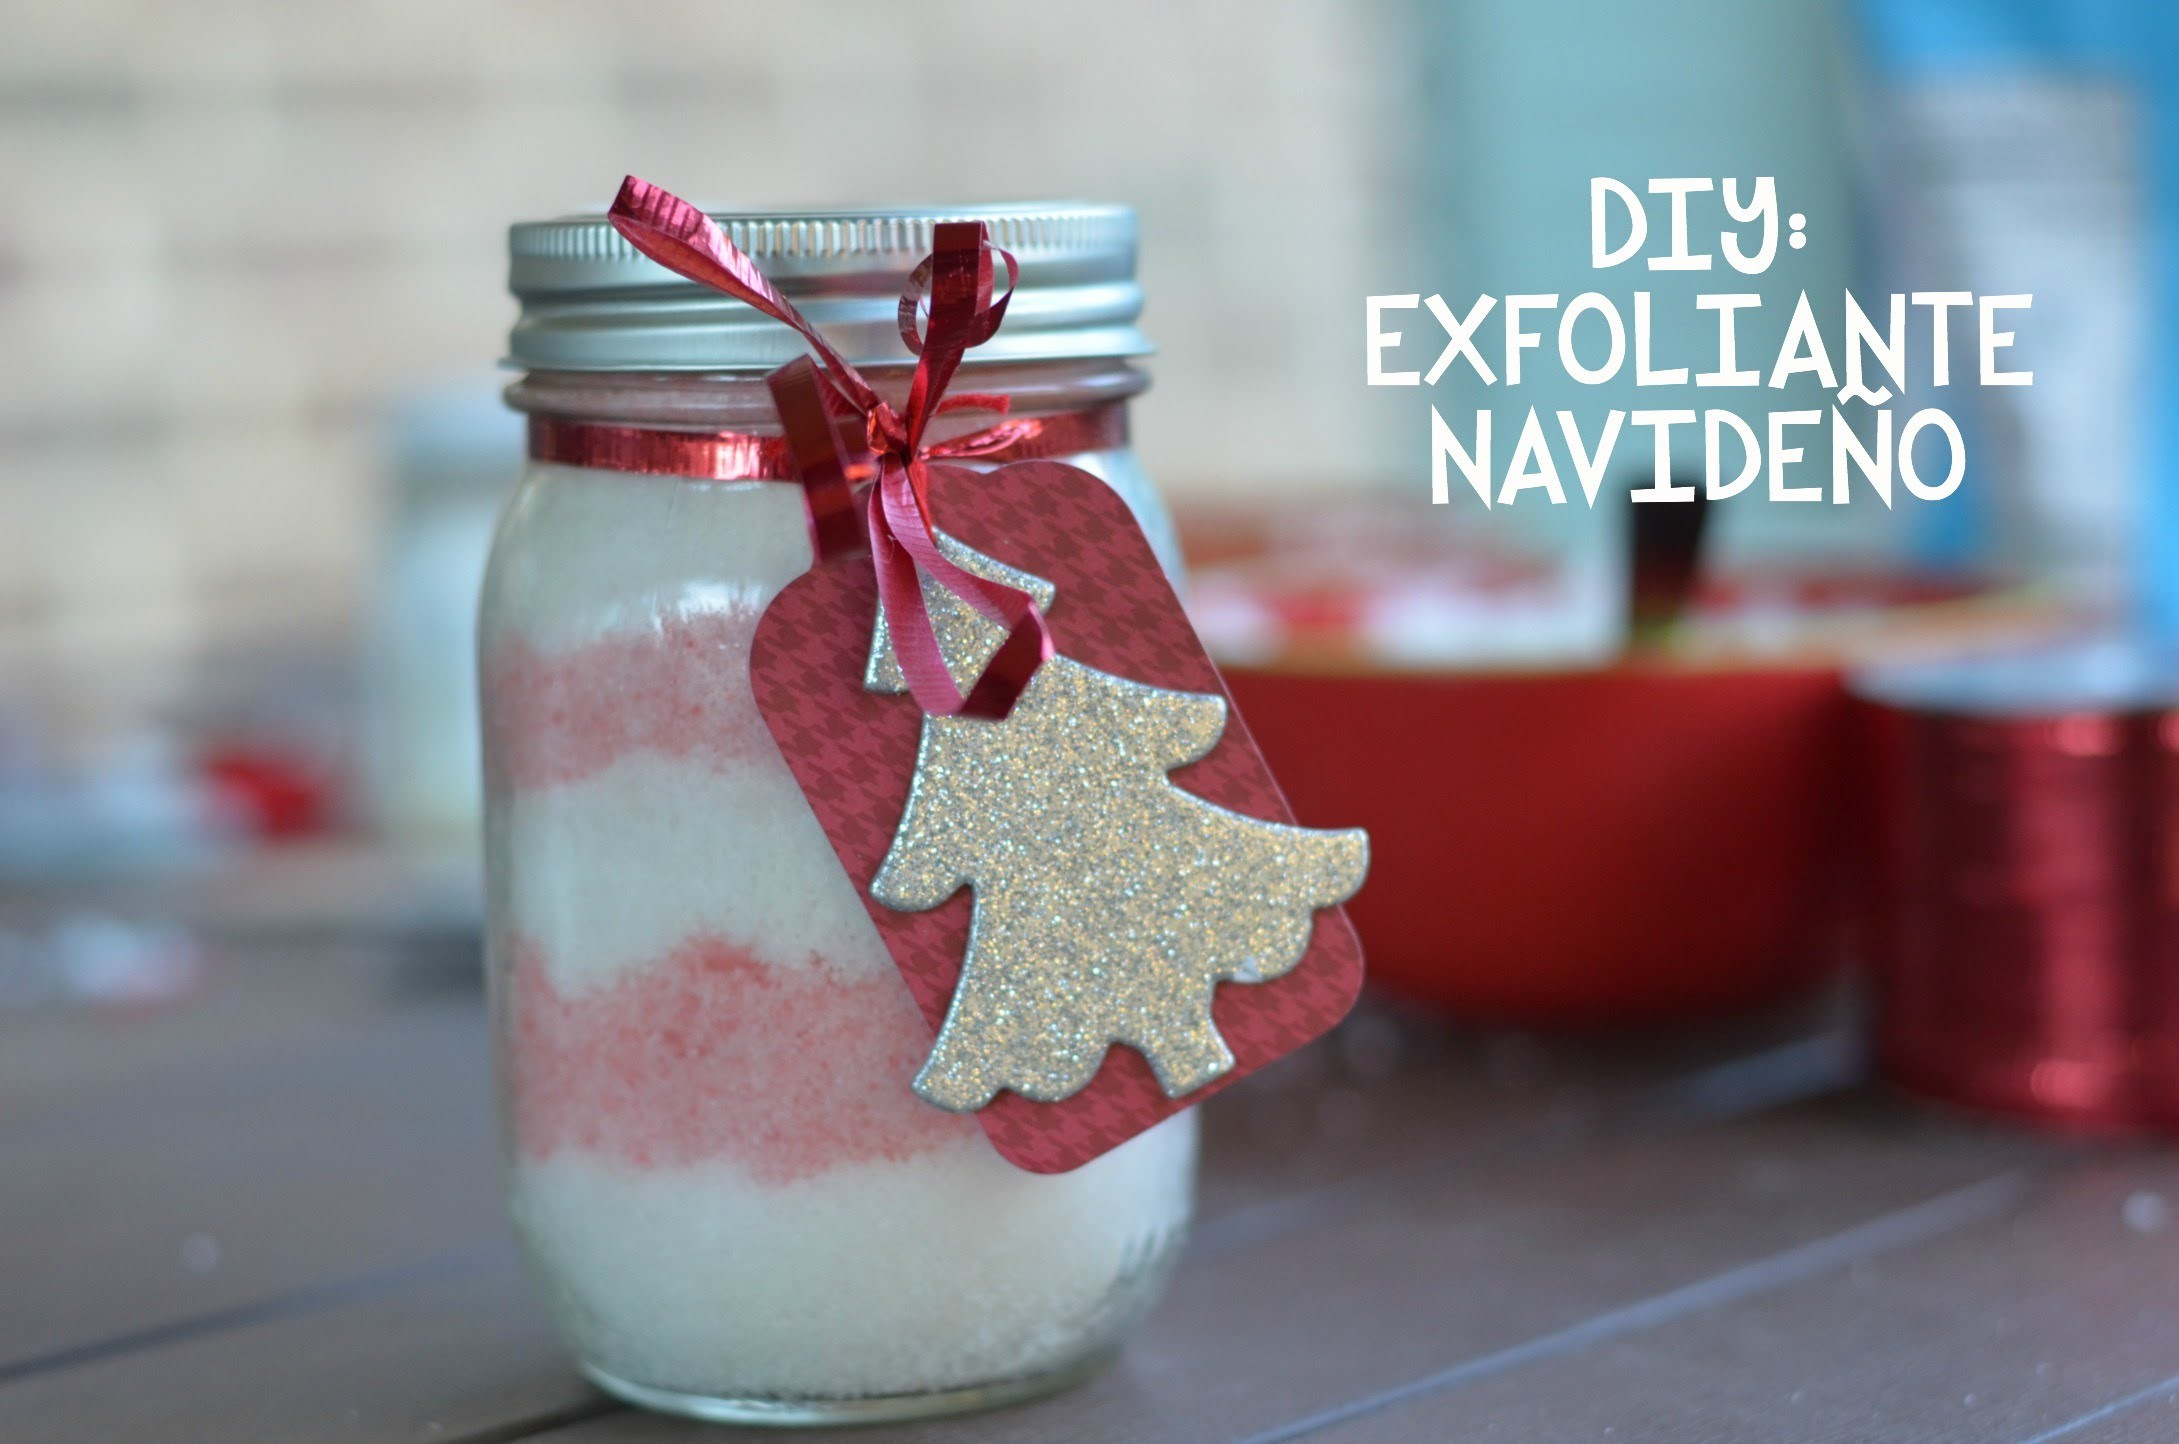 DIY: EXFOLIANTE NAVIDEÑO.